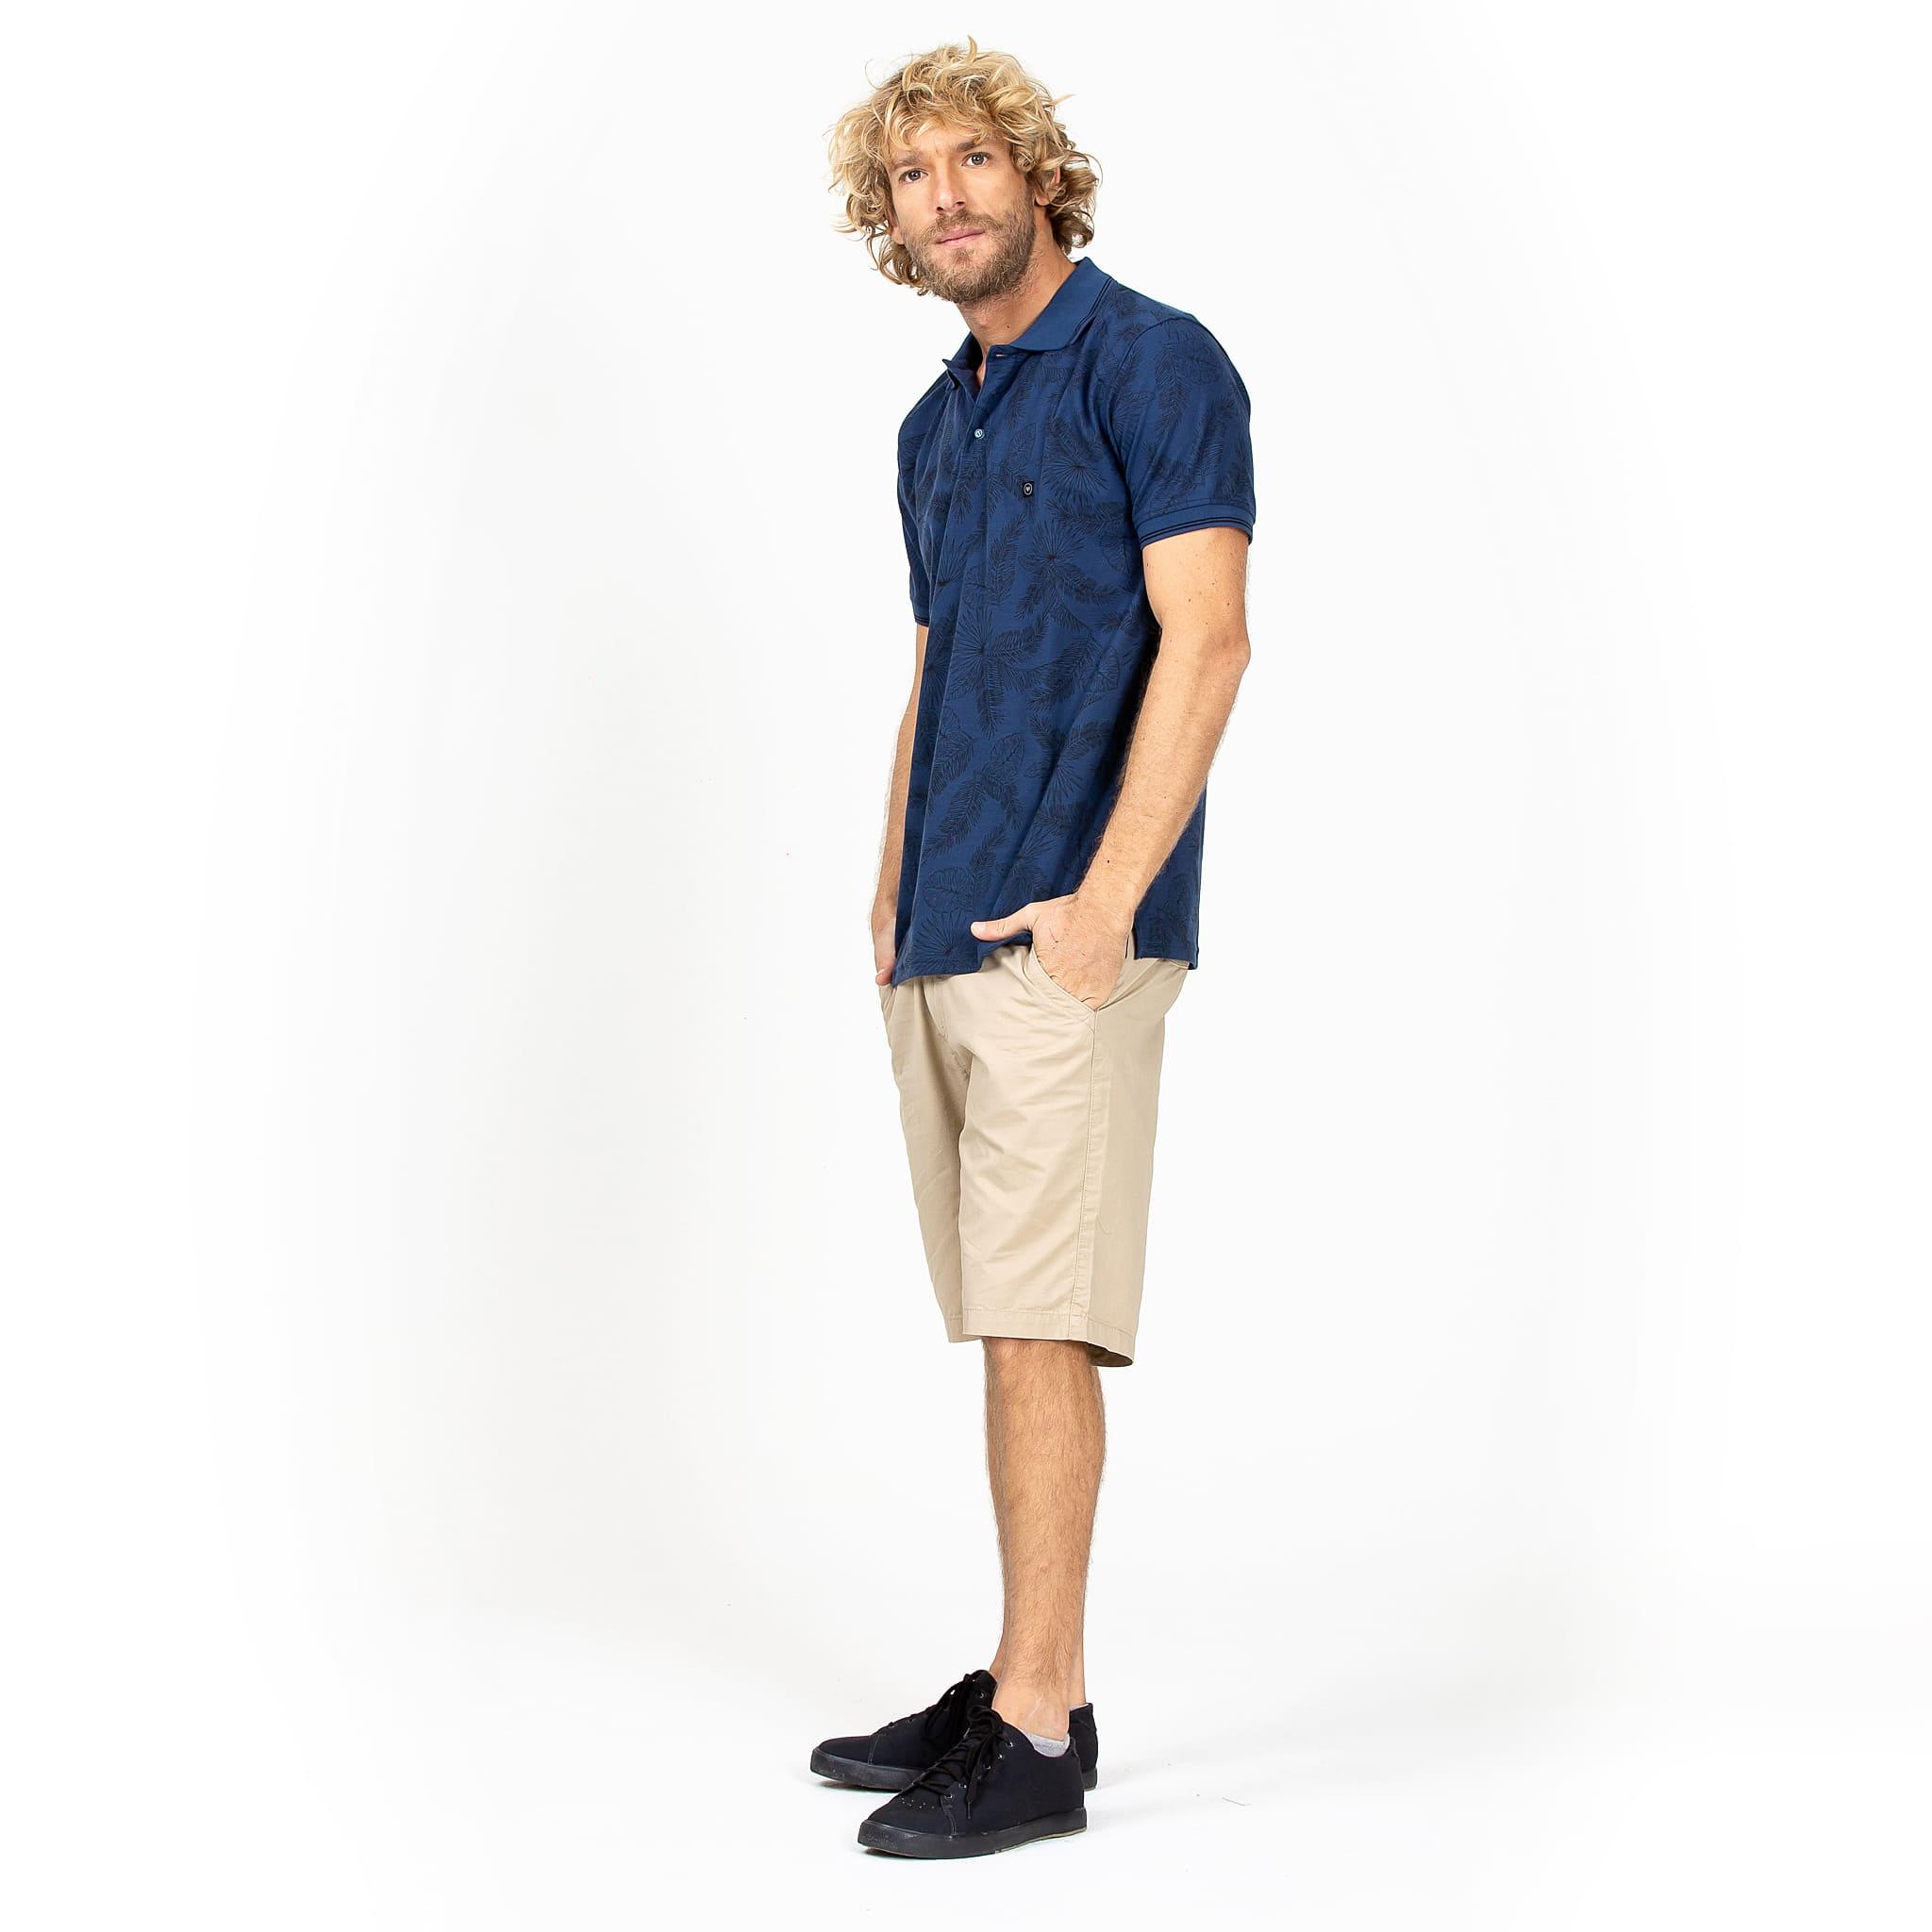 Camisa Polo Folhagens Azul Escuro